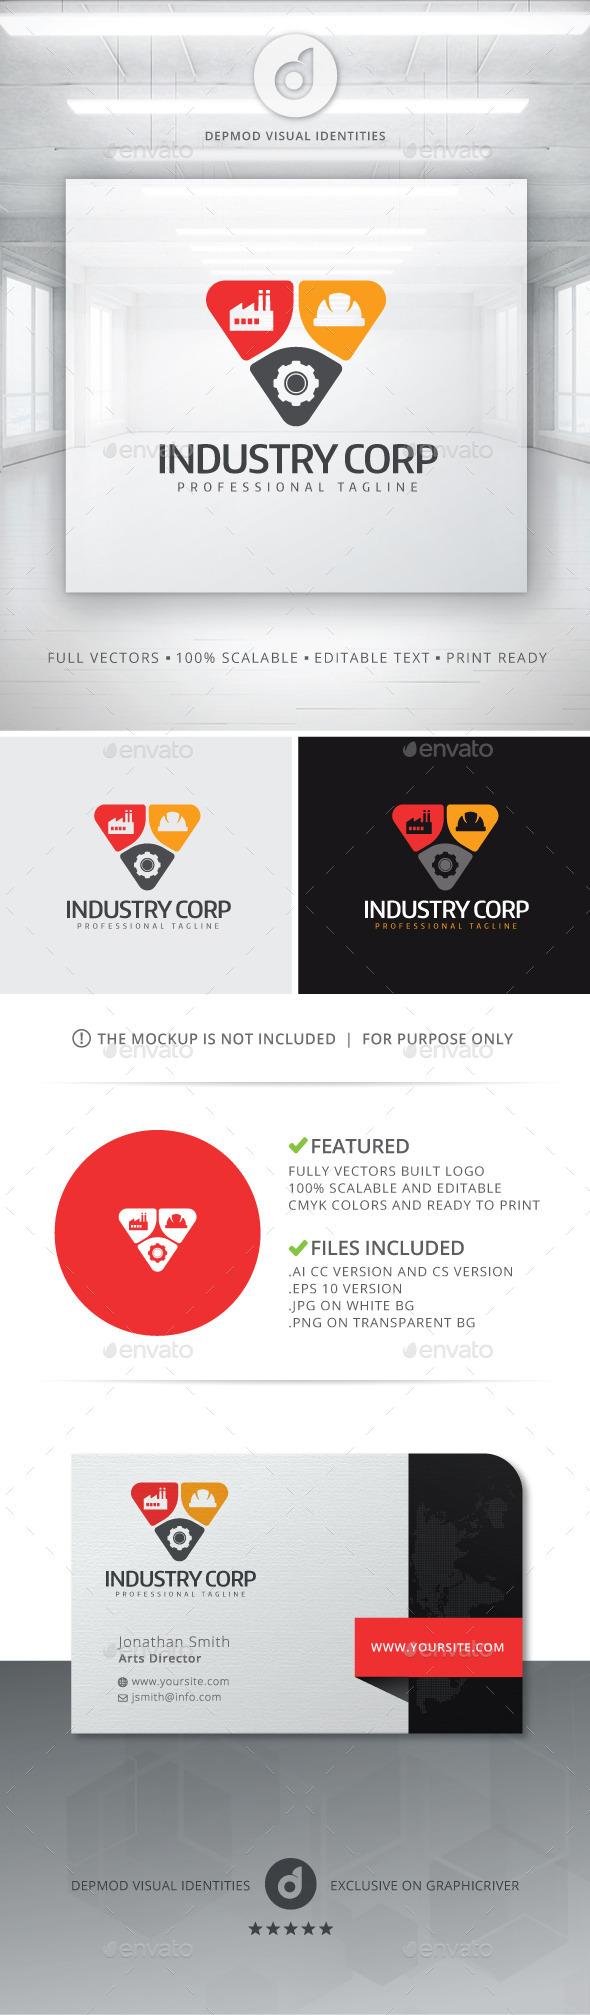 Industry Corp Logo